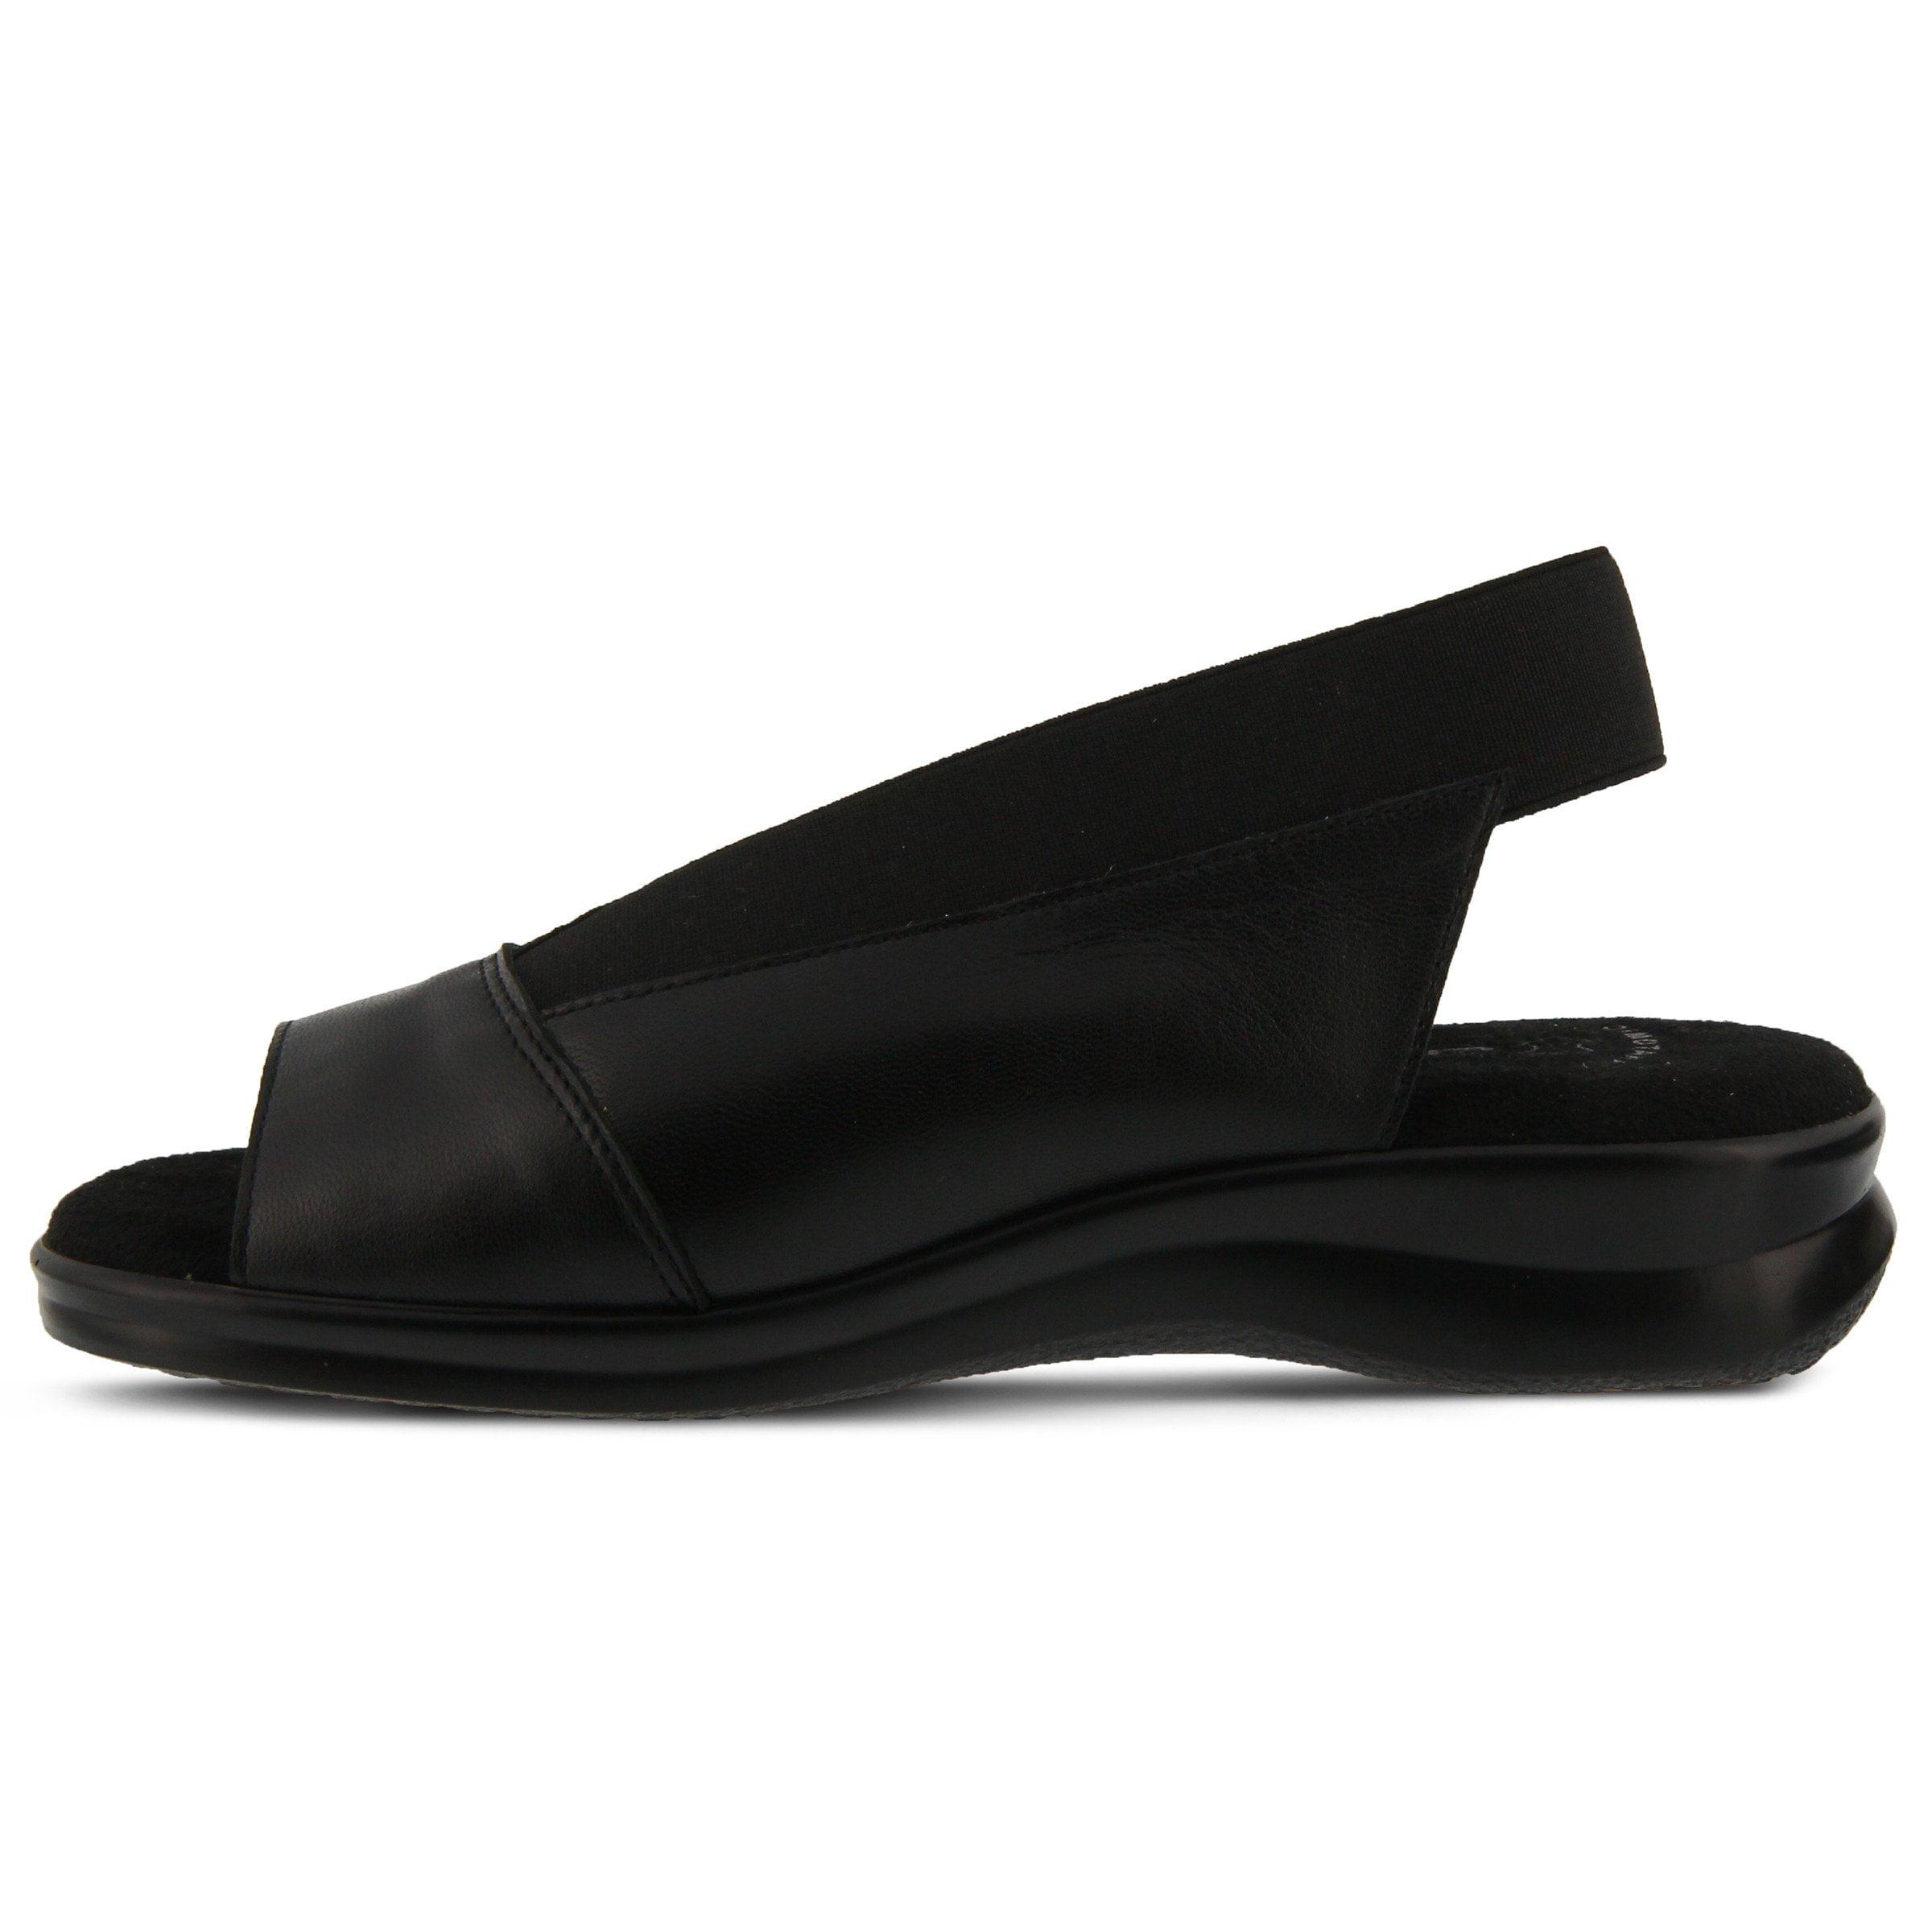 ABARE-B - ABARE 35 Euro (Women US 5) / Black